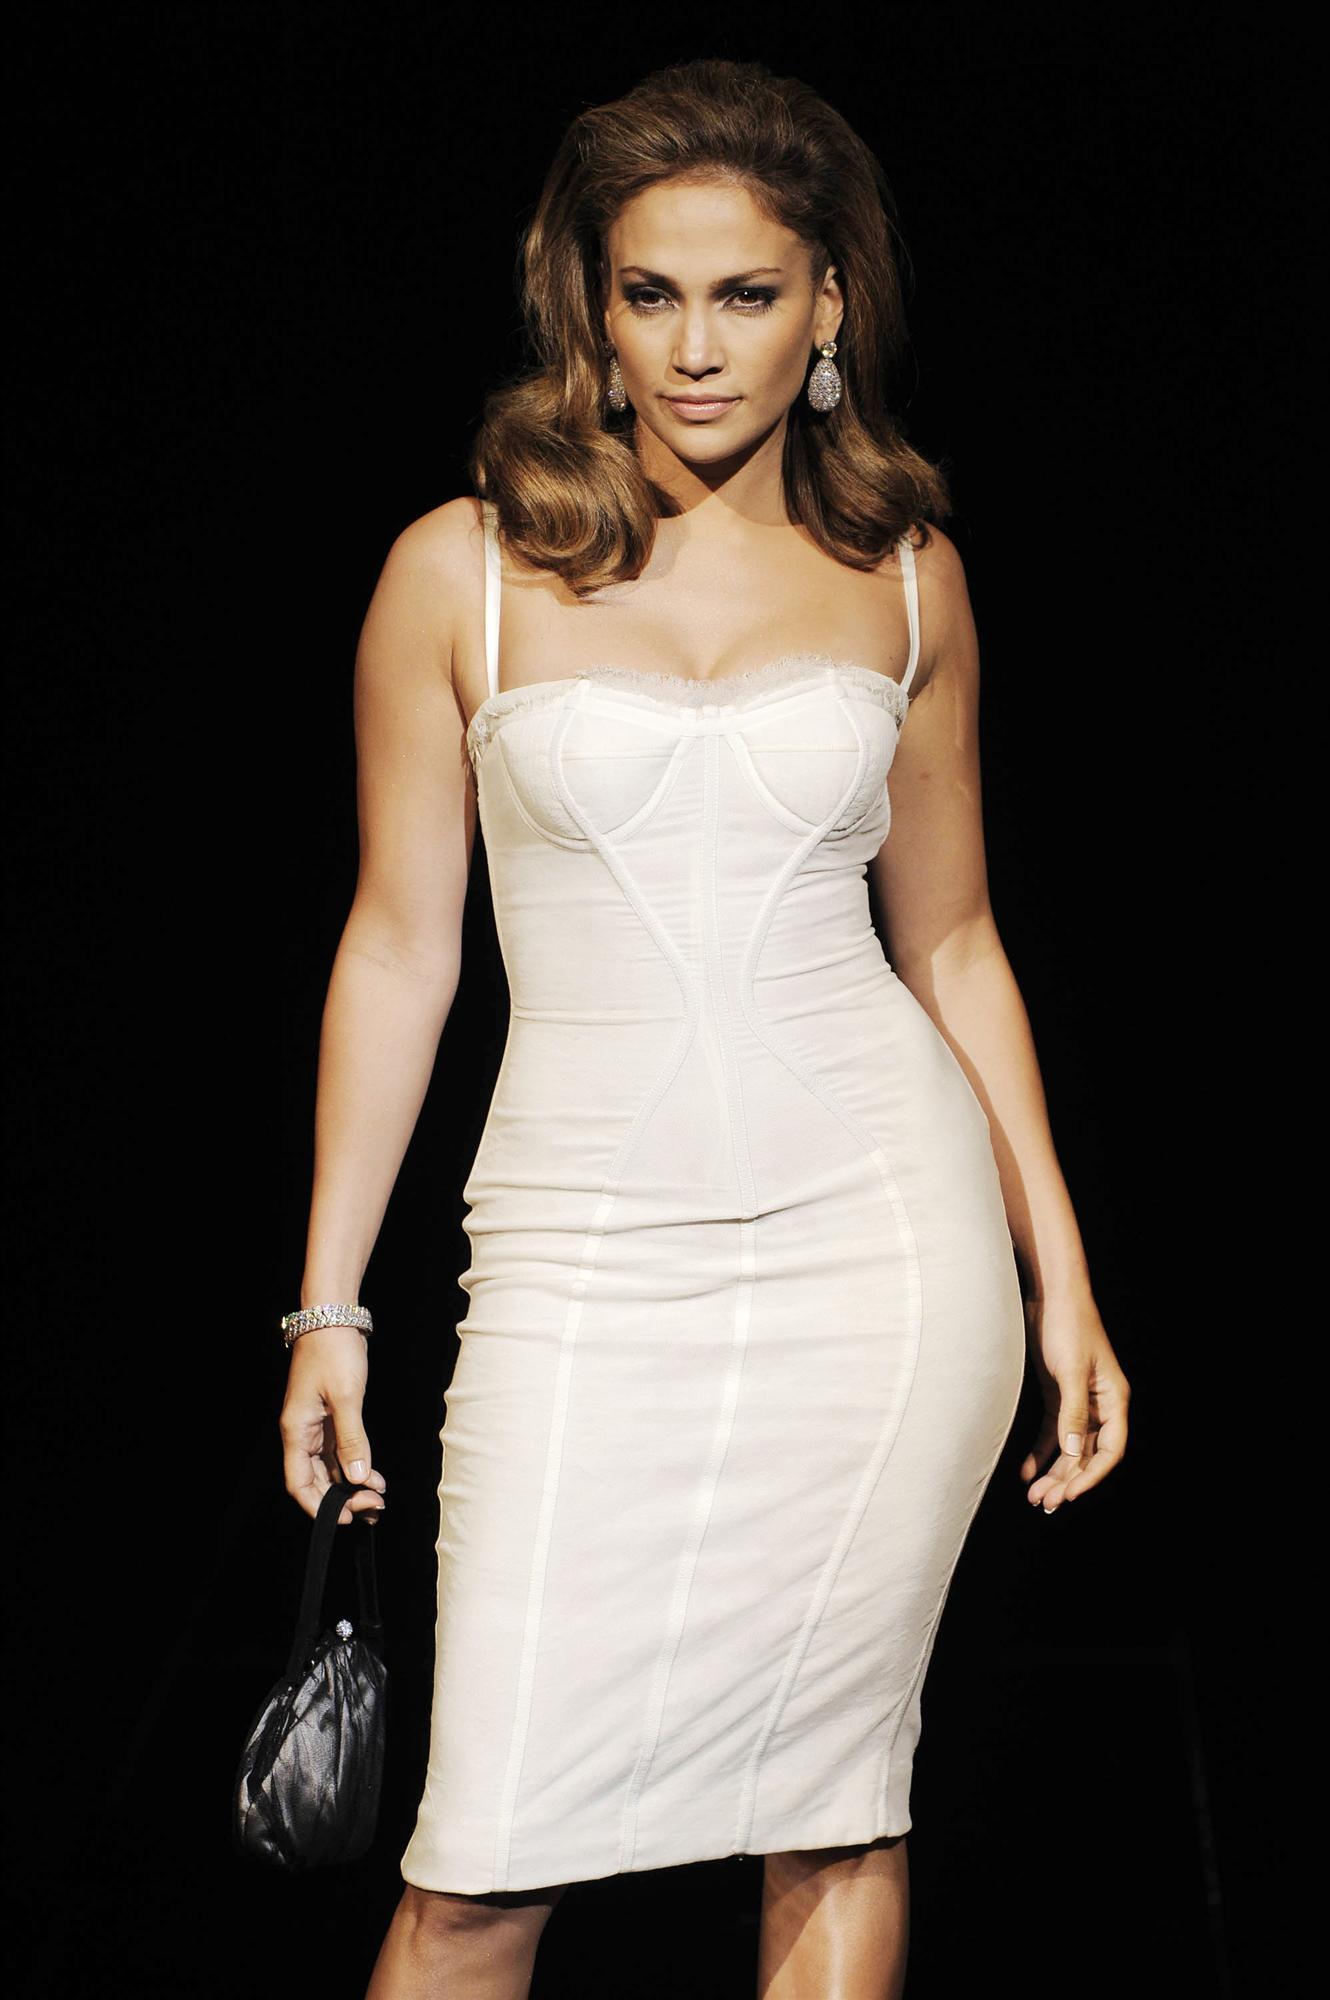 jennifer-lopez-milan_21_10_2008_2.jpg Jennifer Lopez